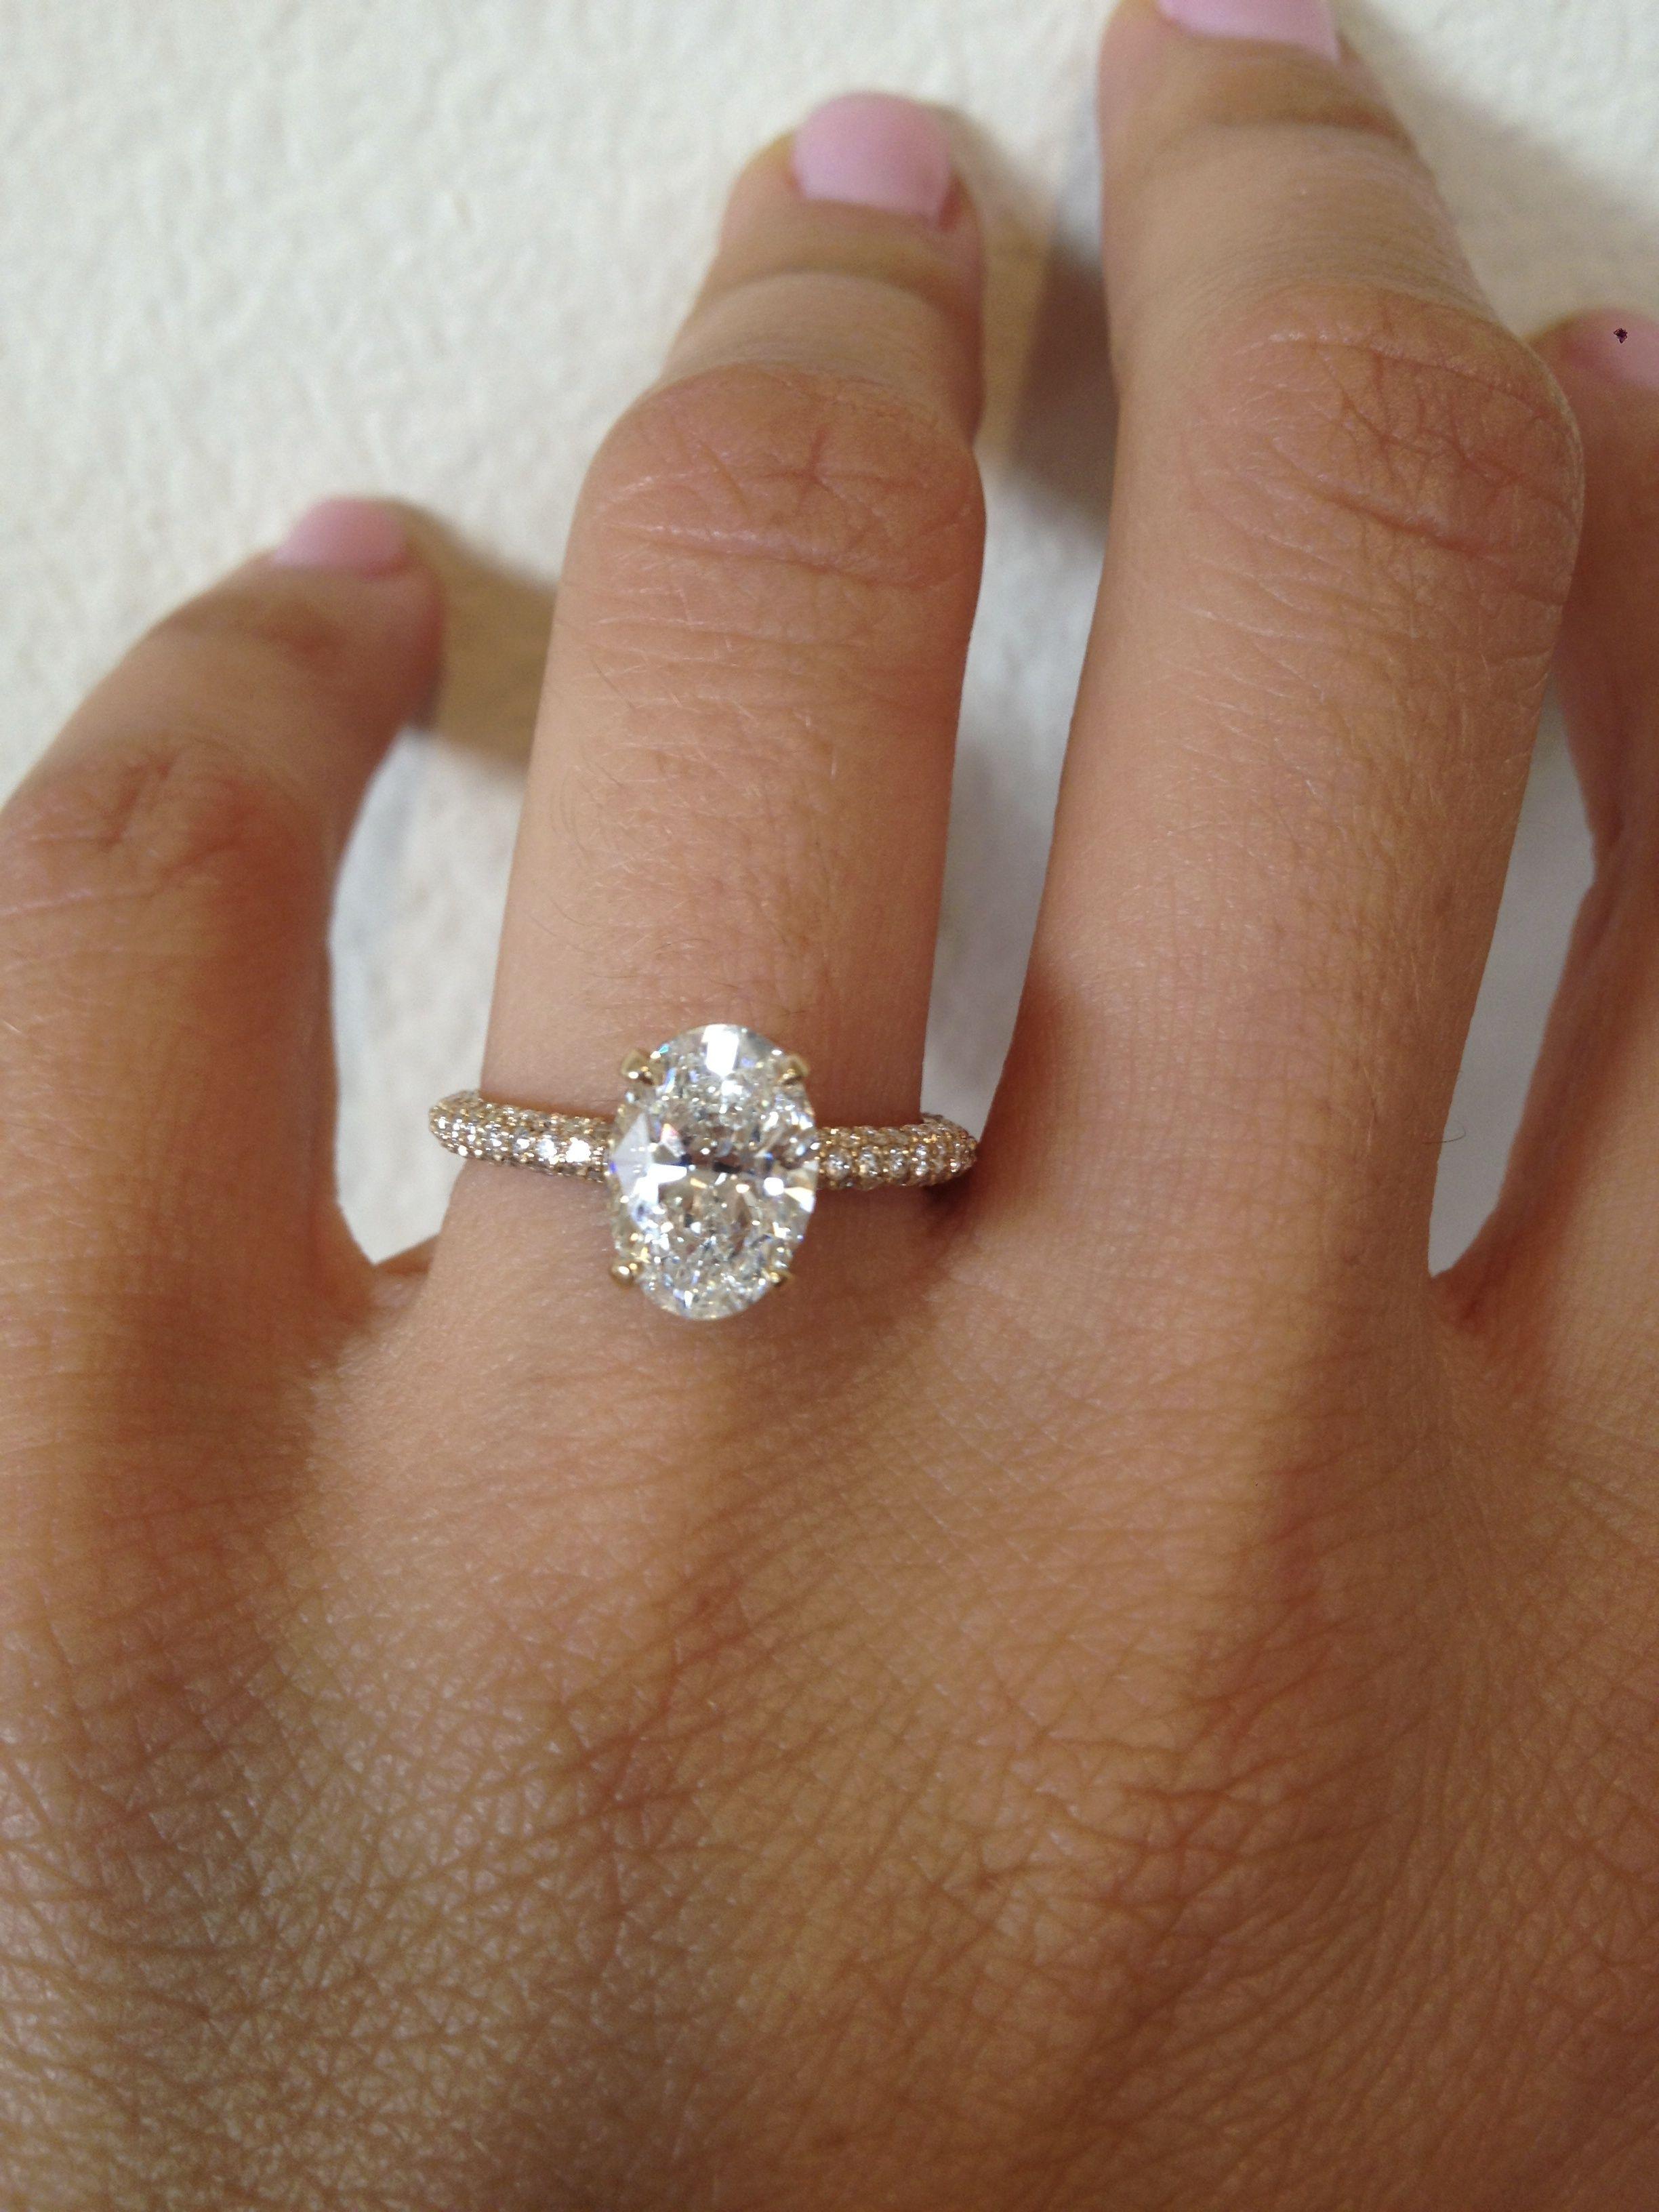 Oval  Diamond  Micro Pave  Thin  Platinum  Bridal  Wedding   Engagement